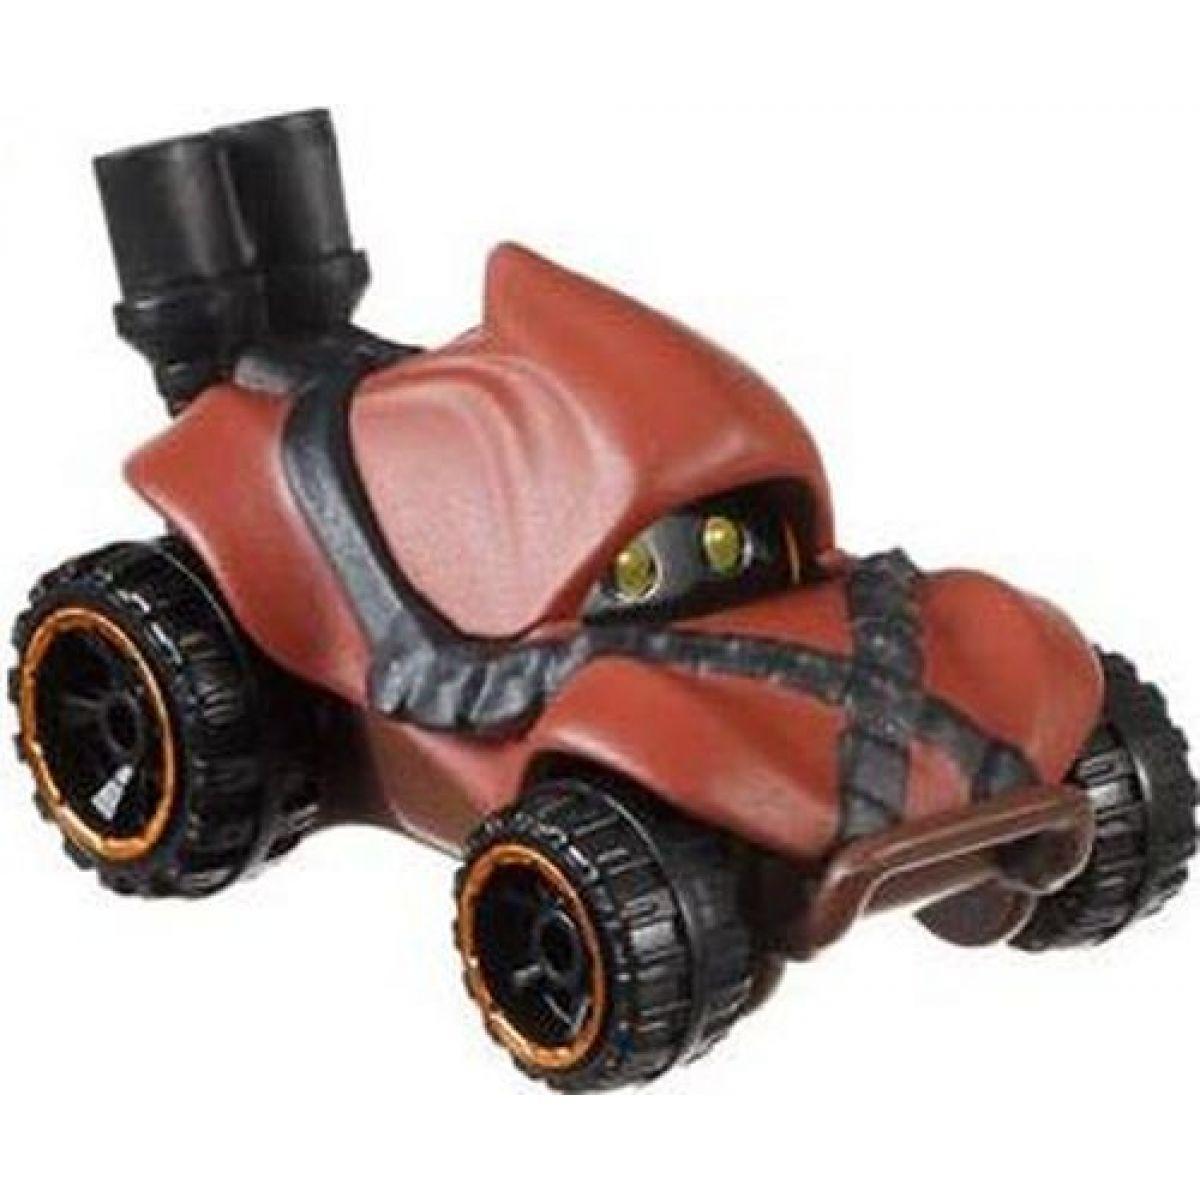 Hot Wheels Star Wars Character cars angličák - Jawa DJL64